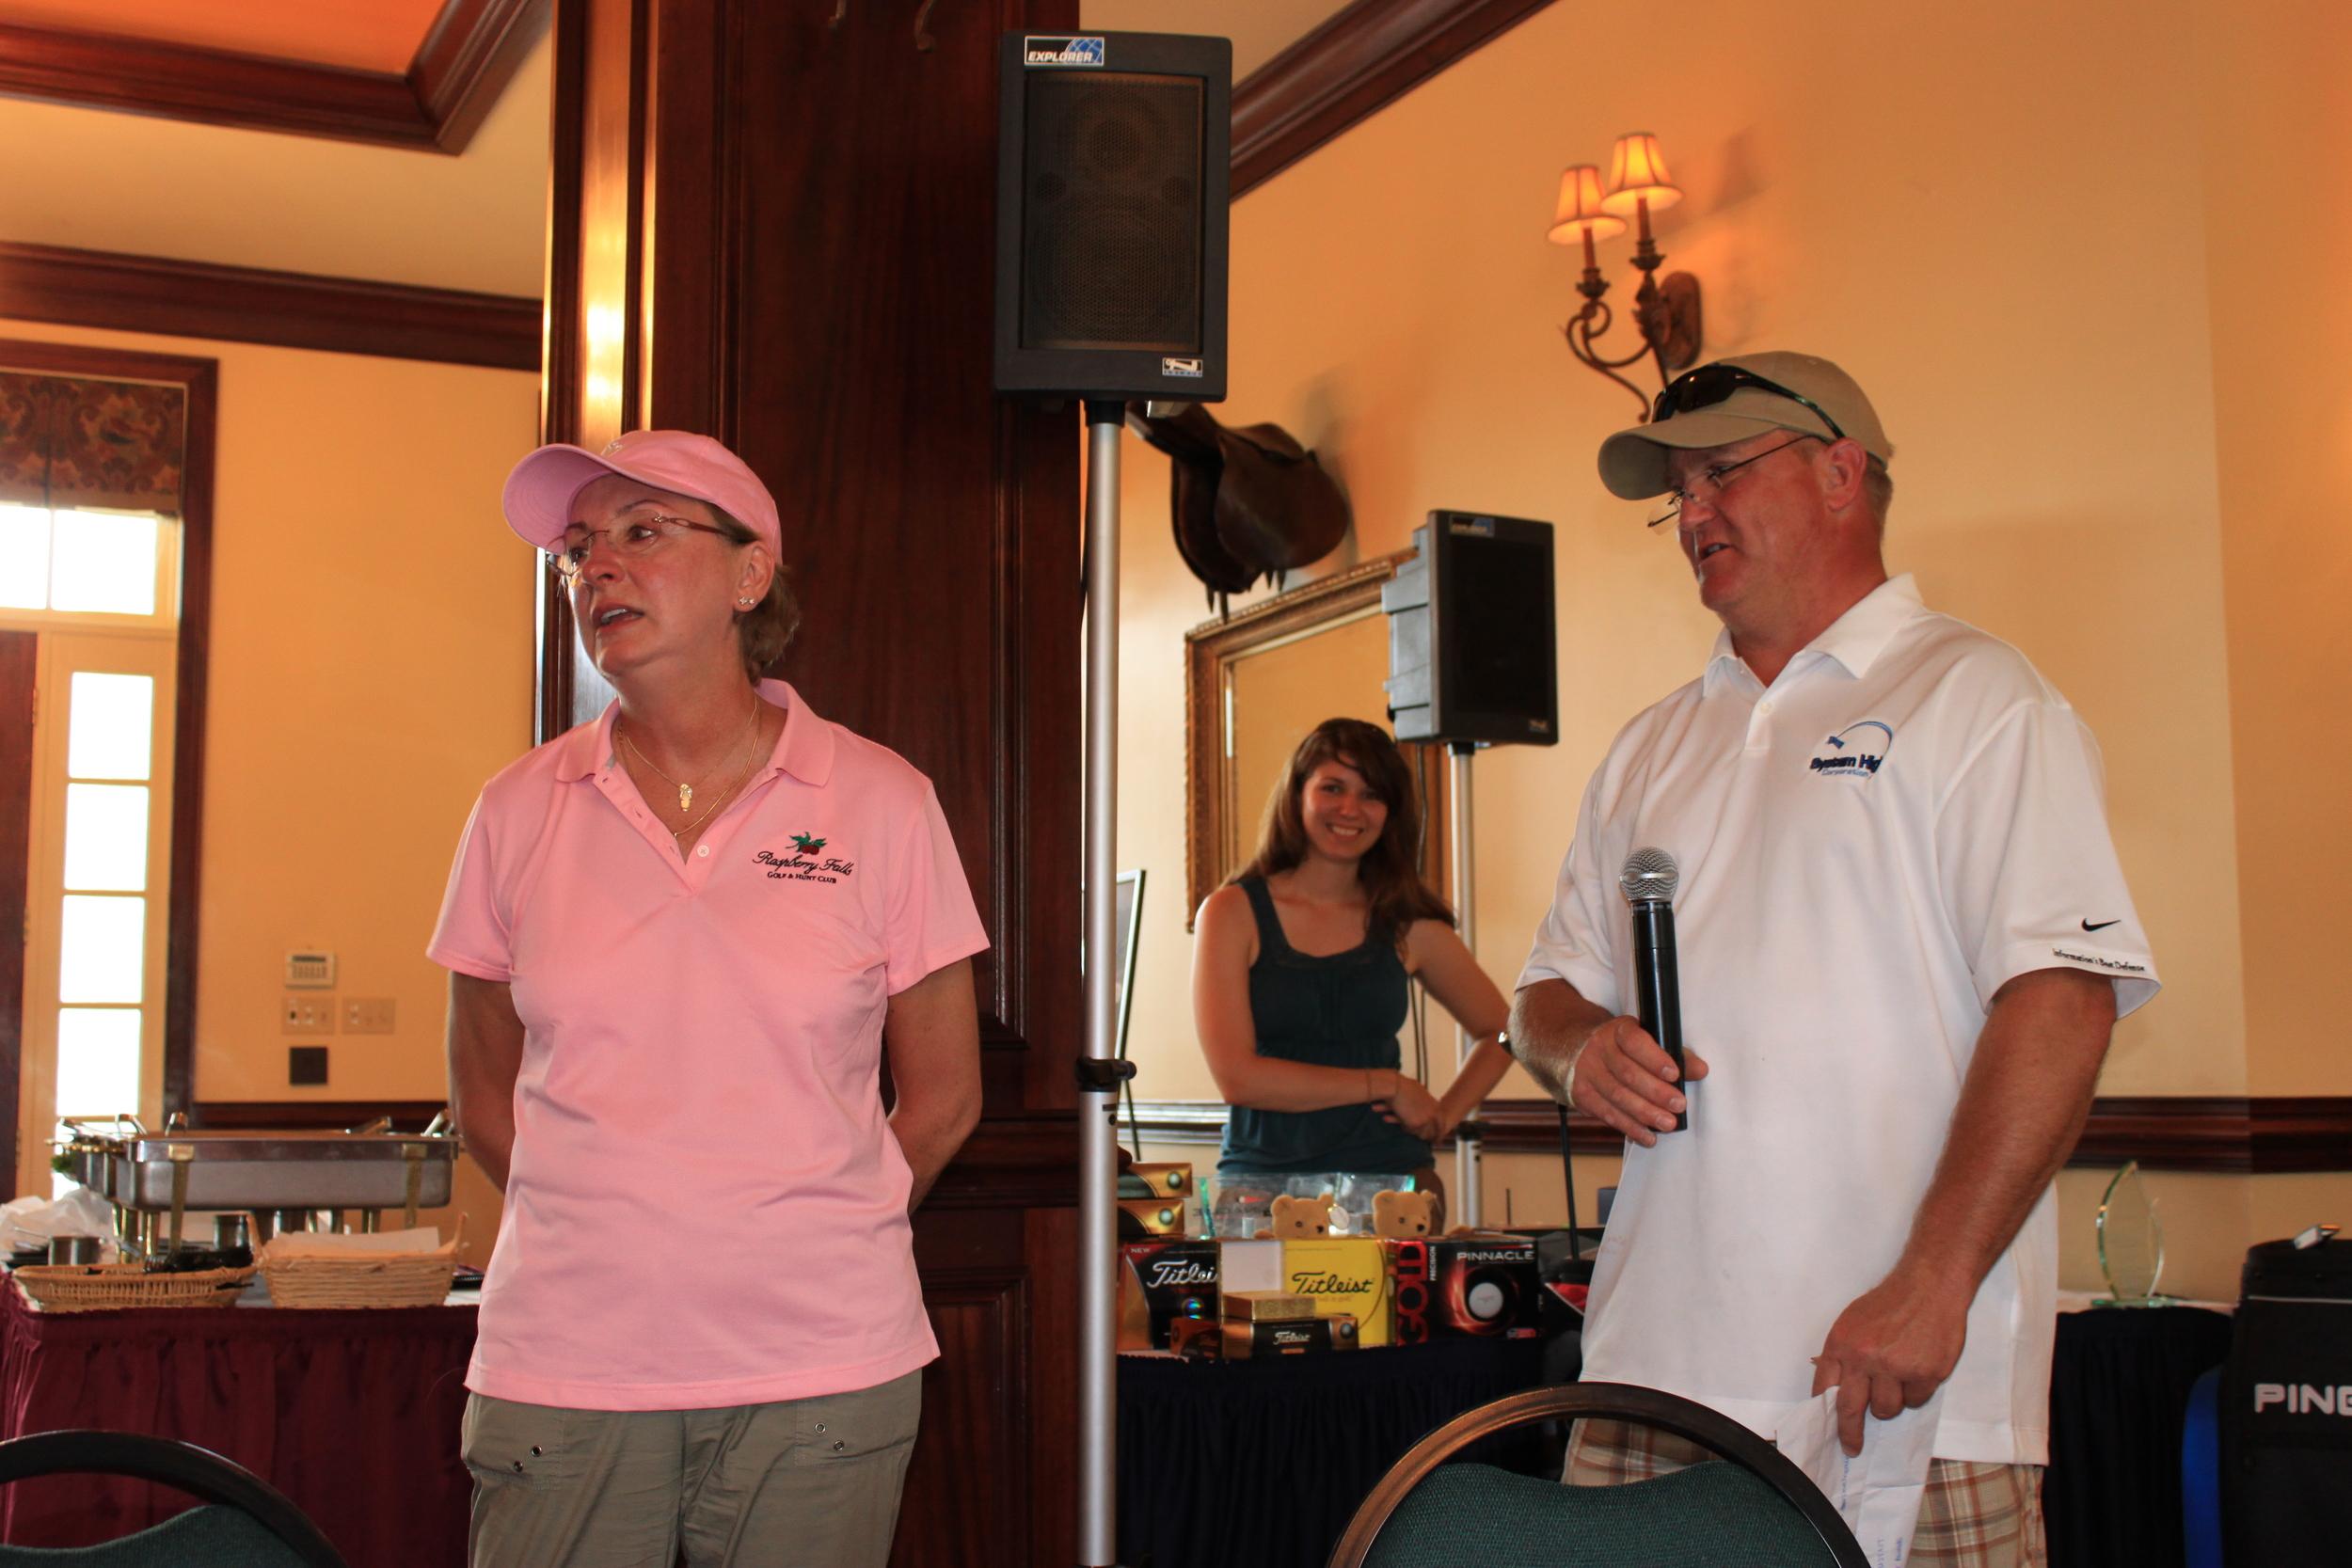 Dennis_Fitzgerald_Golf_Tournament_2011_IMG_3791.JPG